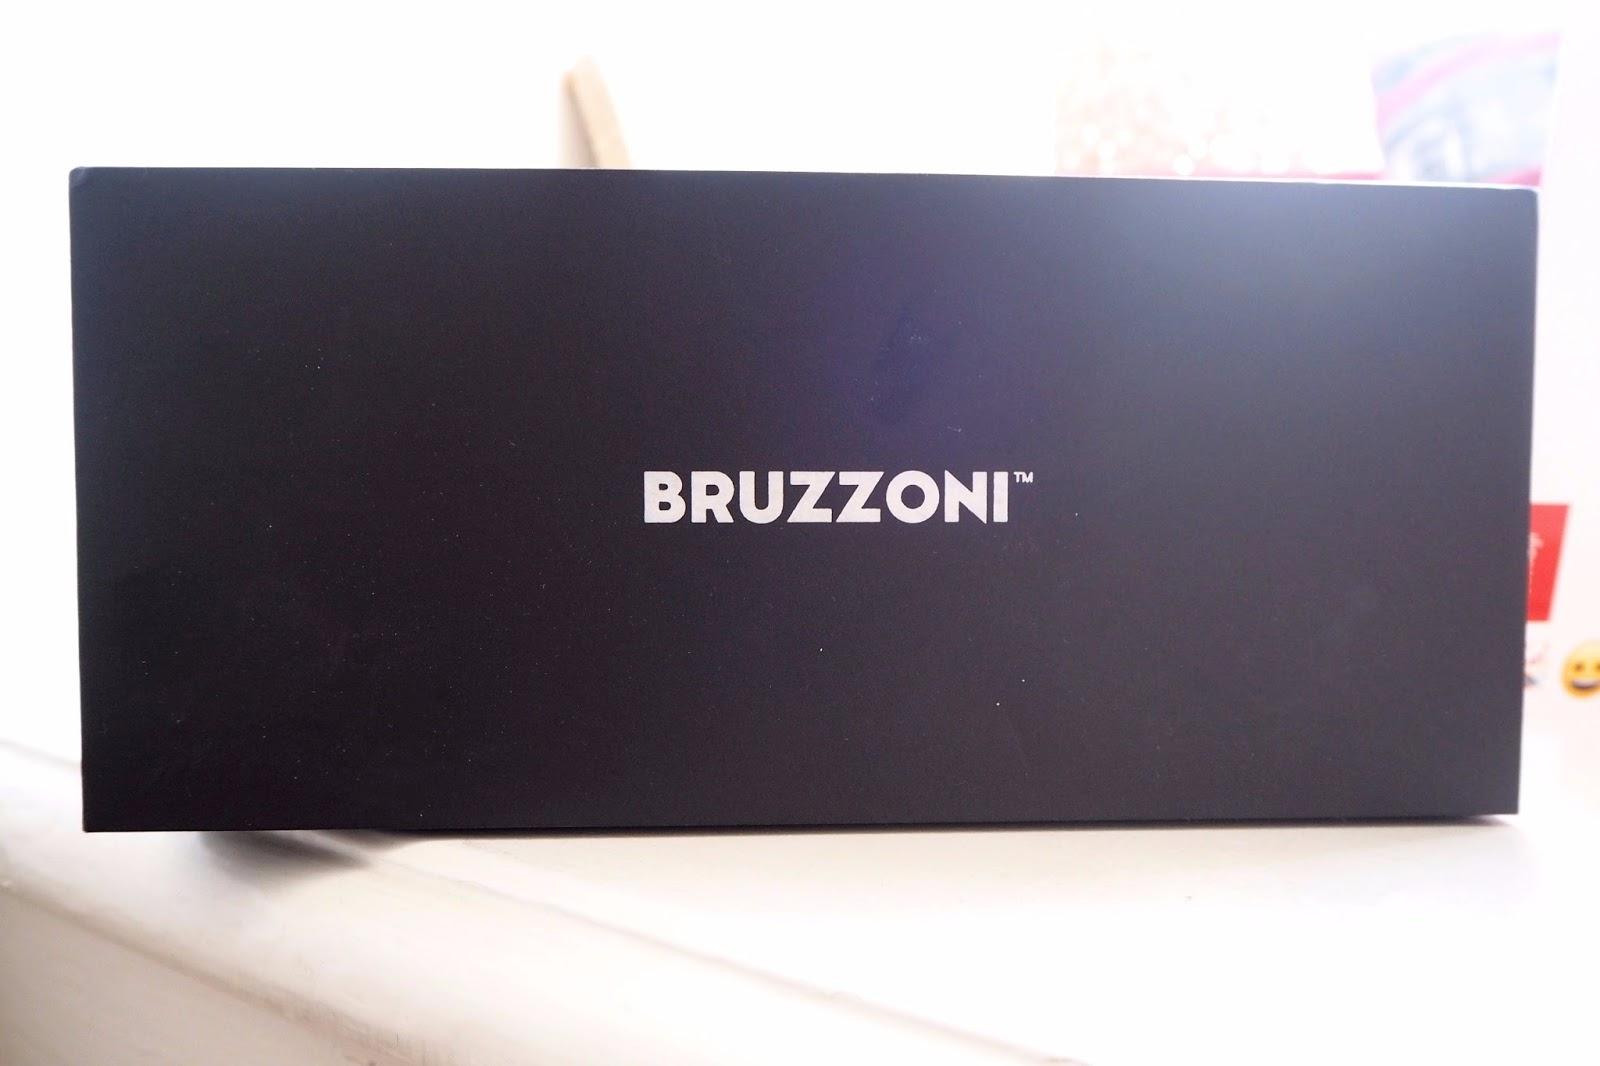 Bruzzoni Box